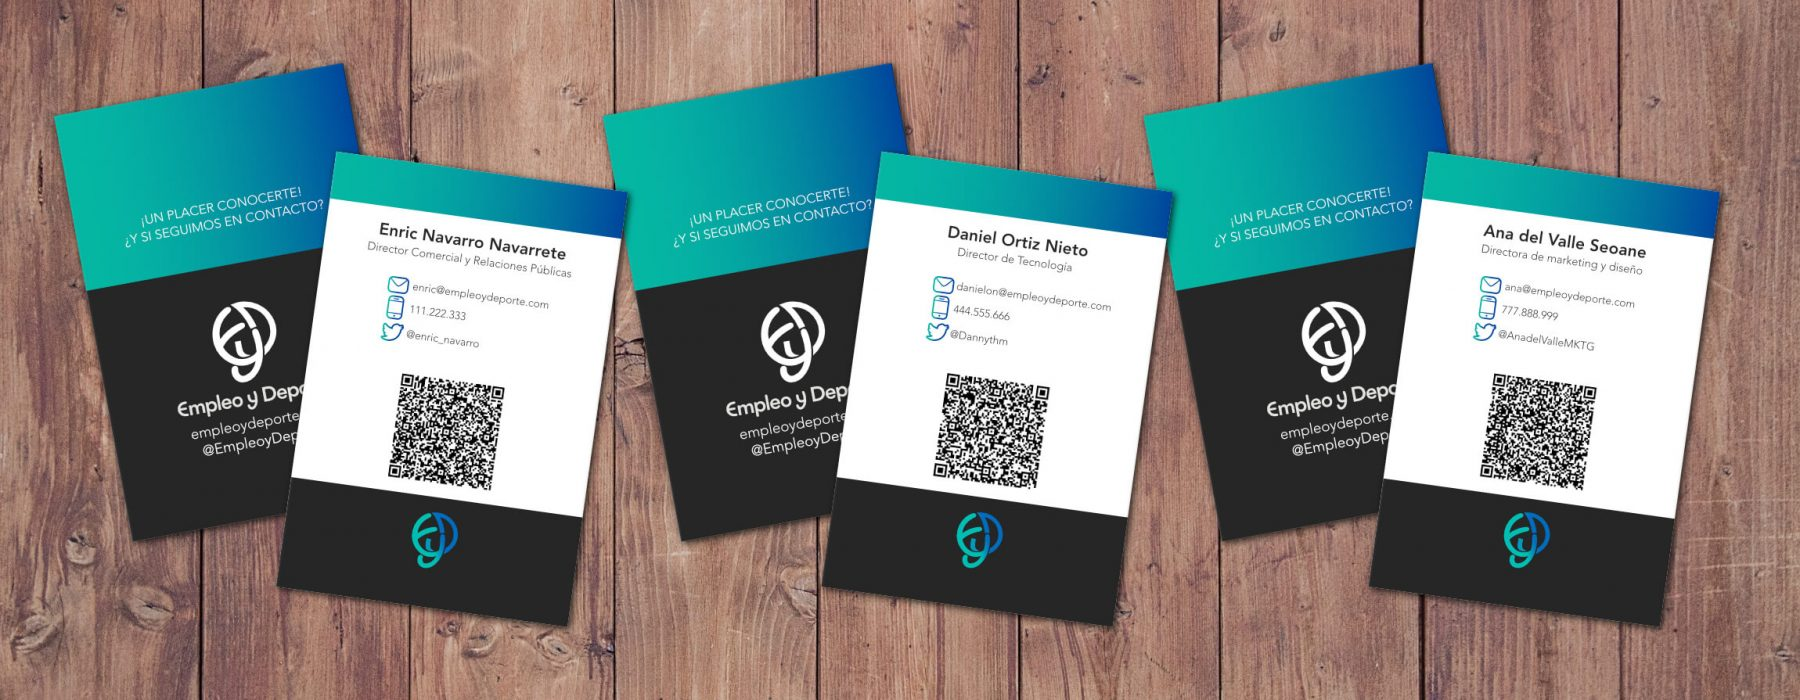 Tarjetas Business Card Empleo y Deporte juntas